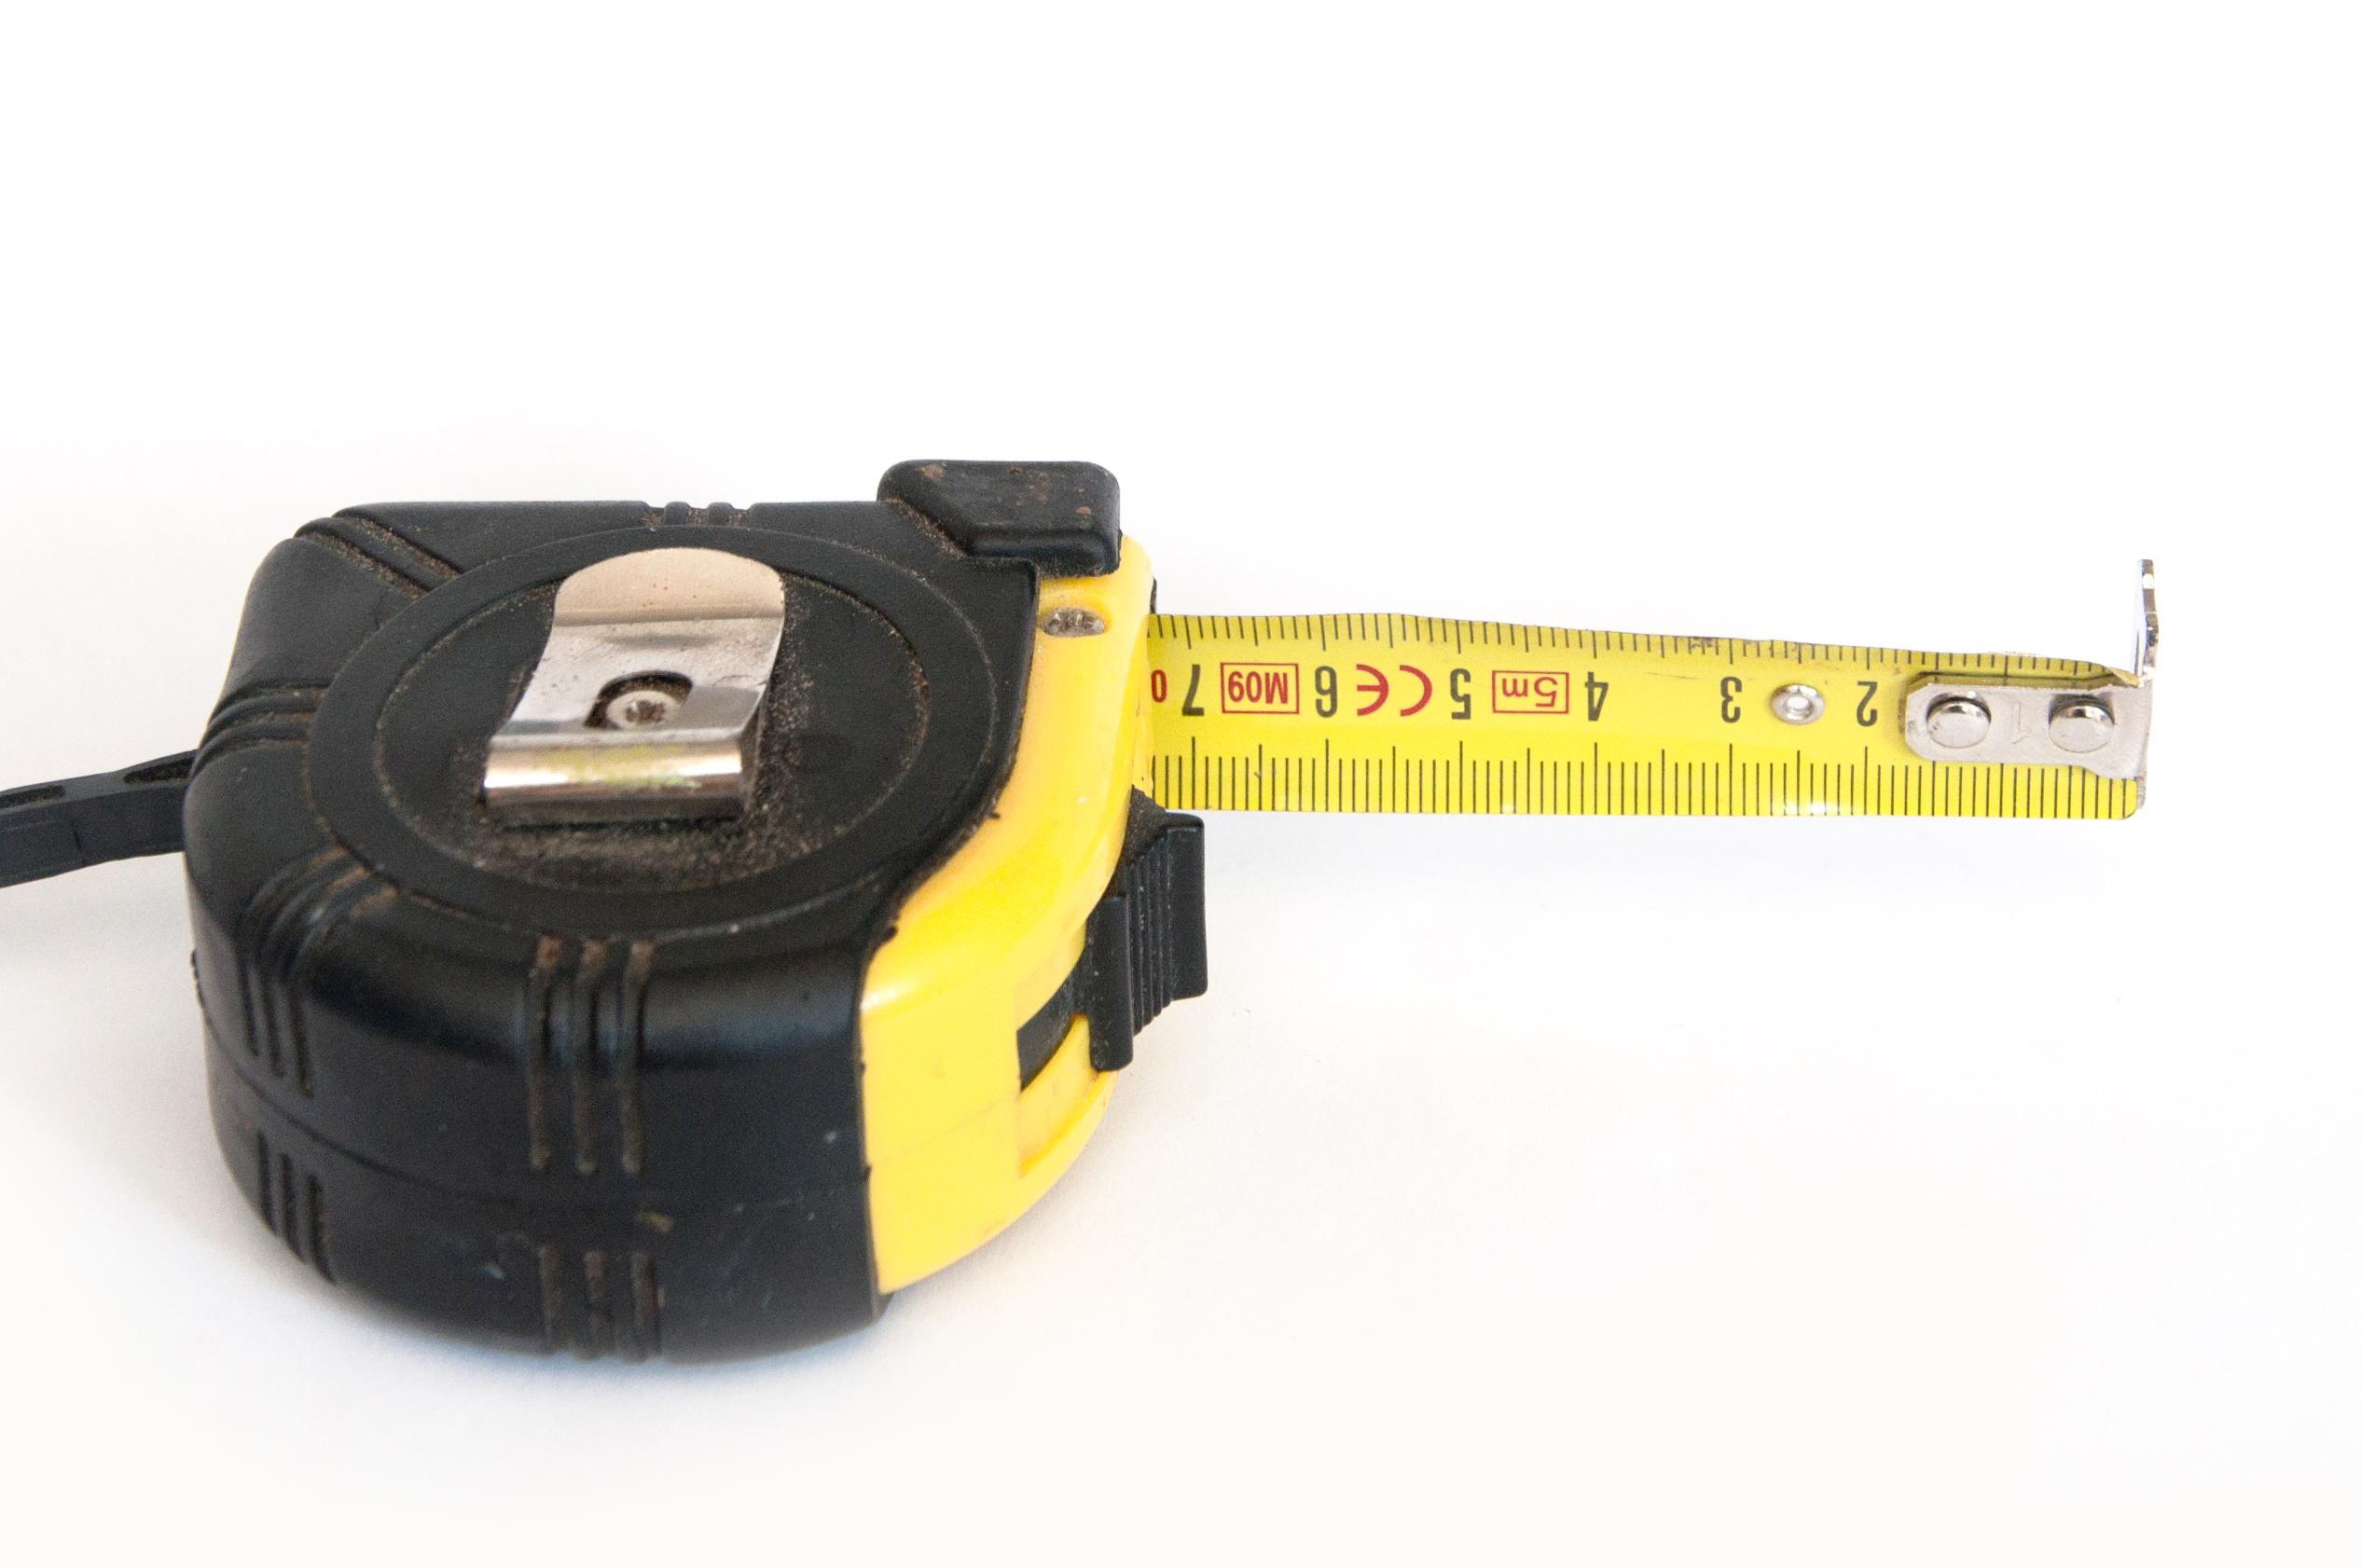 Measuring tape, White, Meter, Tool, Tape, HQ Photo